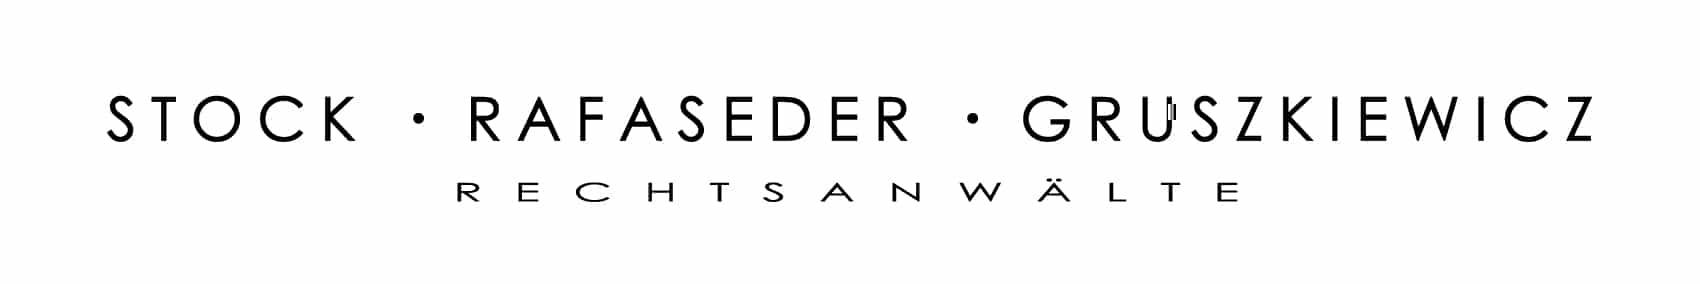 Stock Rafaseder Gruszkiewicz Rechtsanwälte Logo